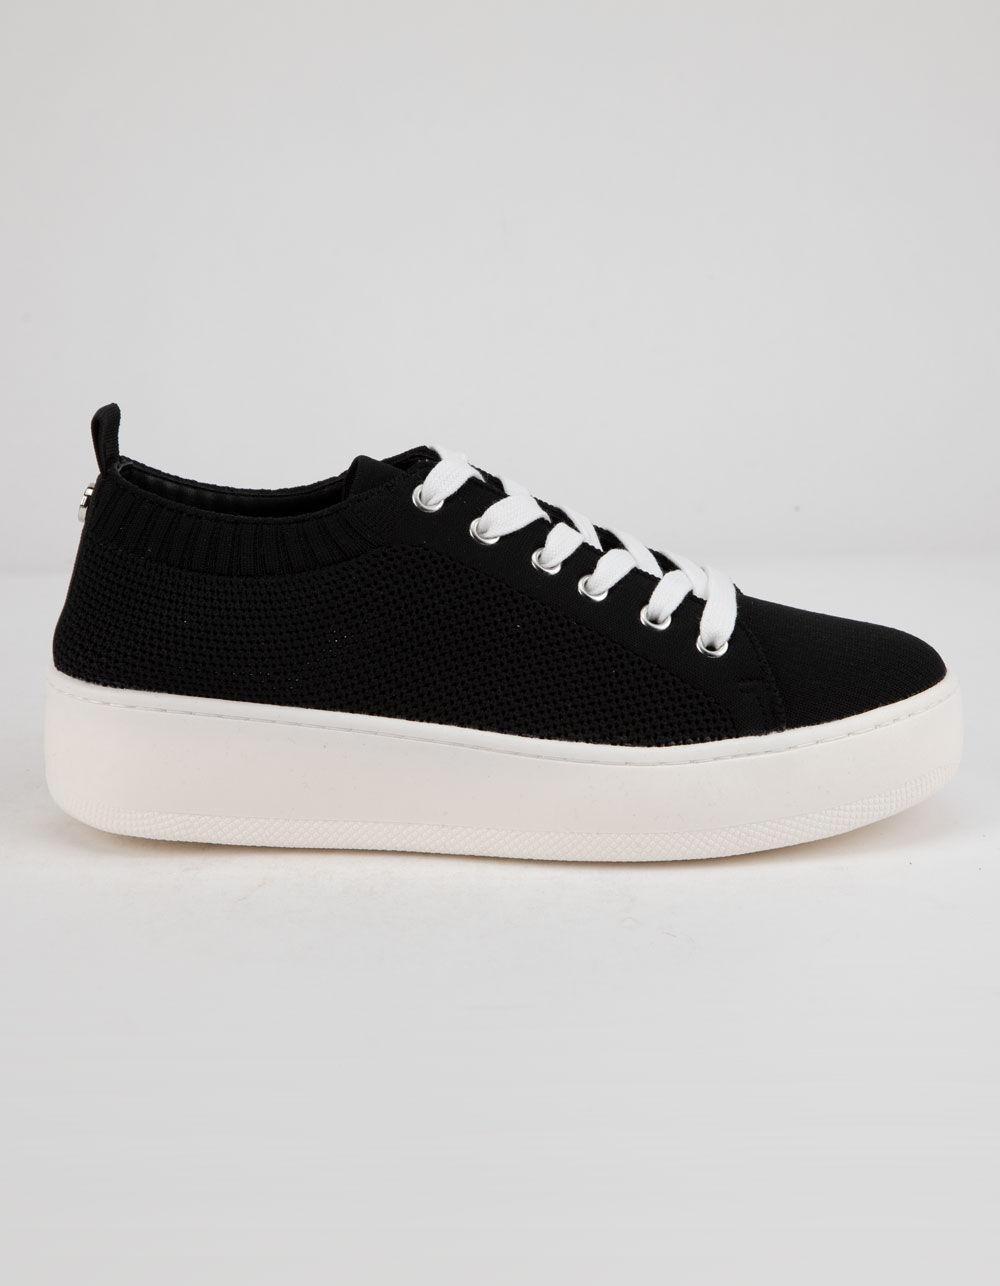 STEVE MADDEN Bardo Black Platform Shoes